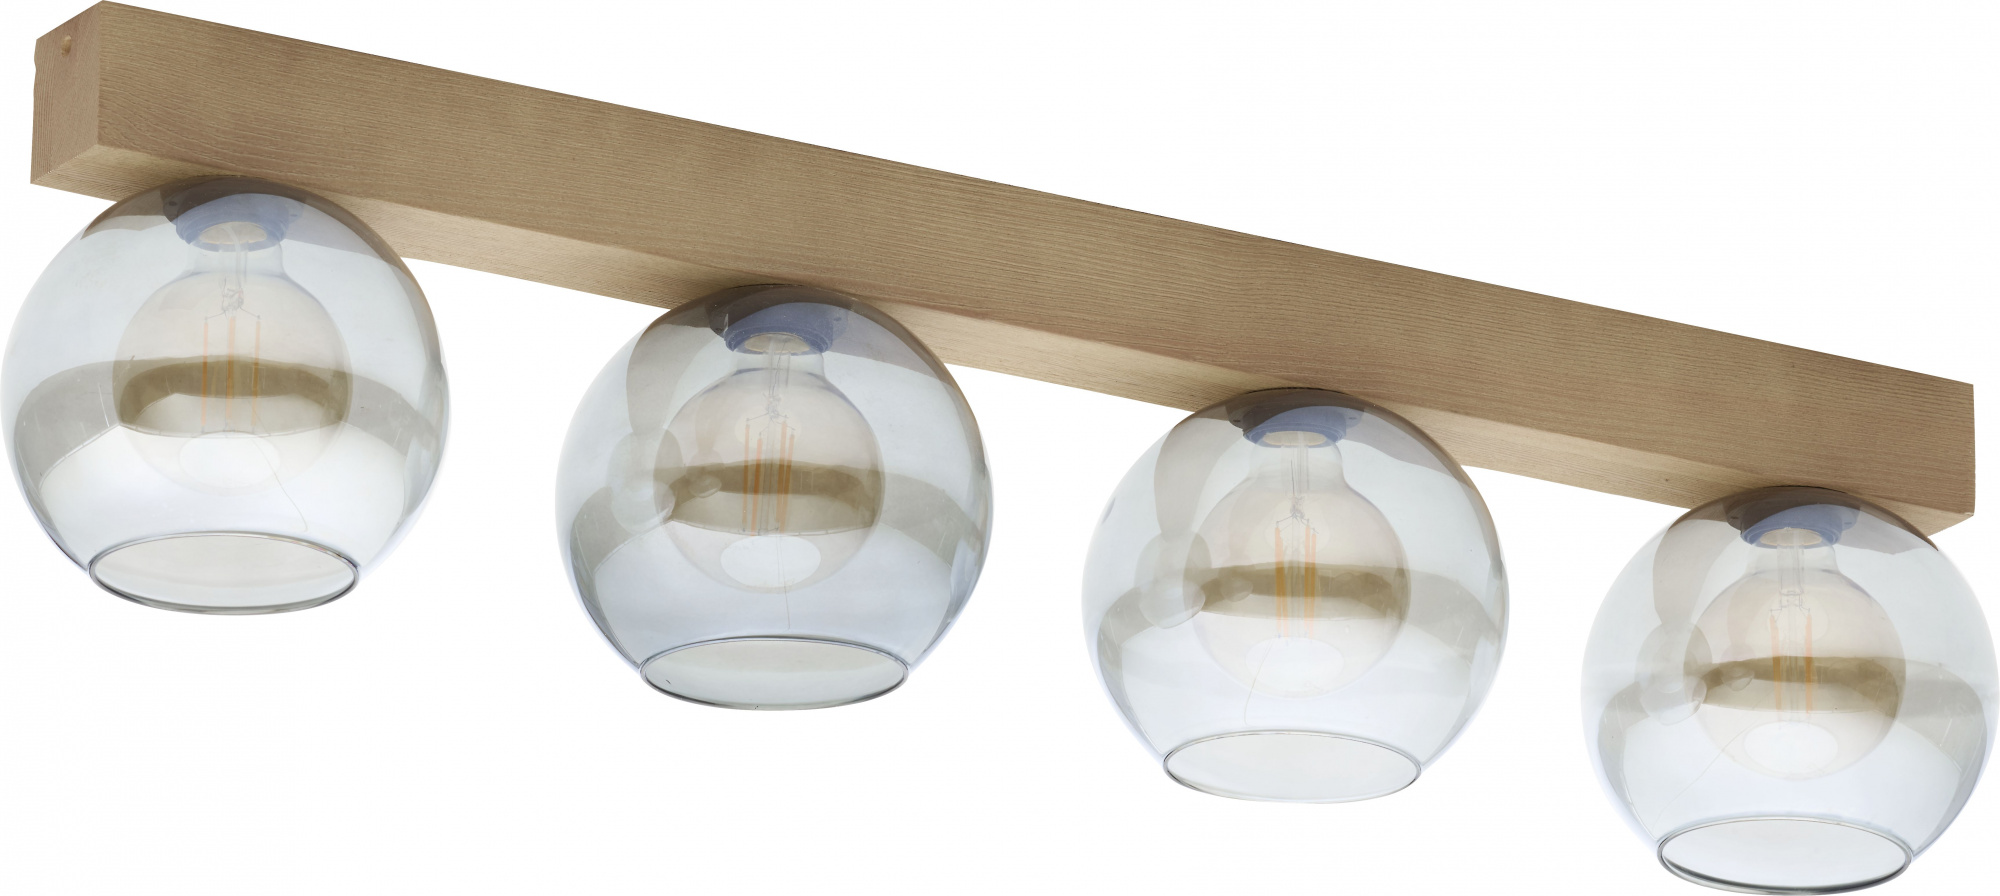 TK Lighting TK-4257 Artwood Glass mennyezeti lámpa